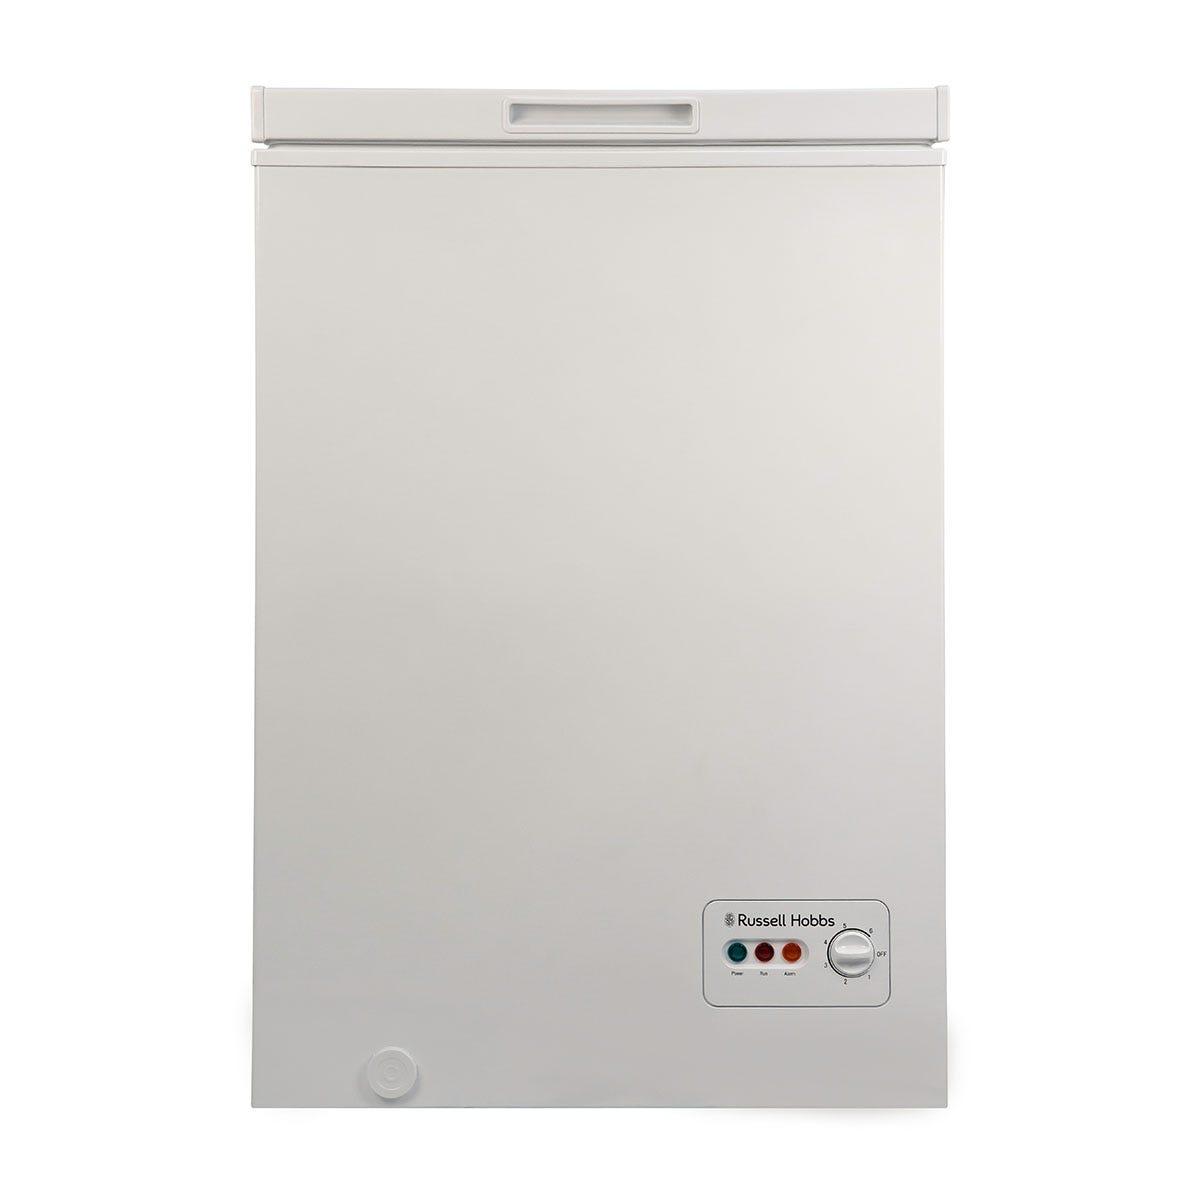 Russell Hobbs RHCF103 99 Litre Chest Freezer - White